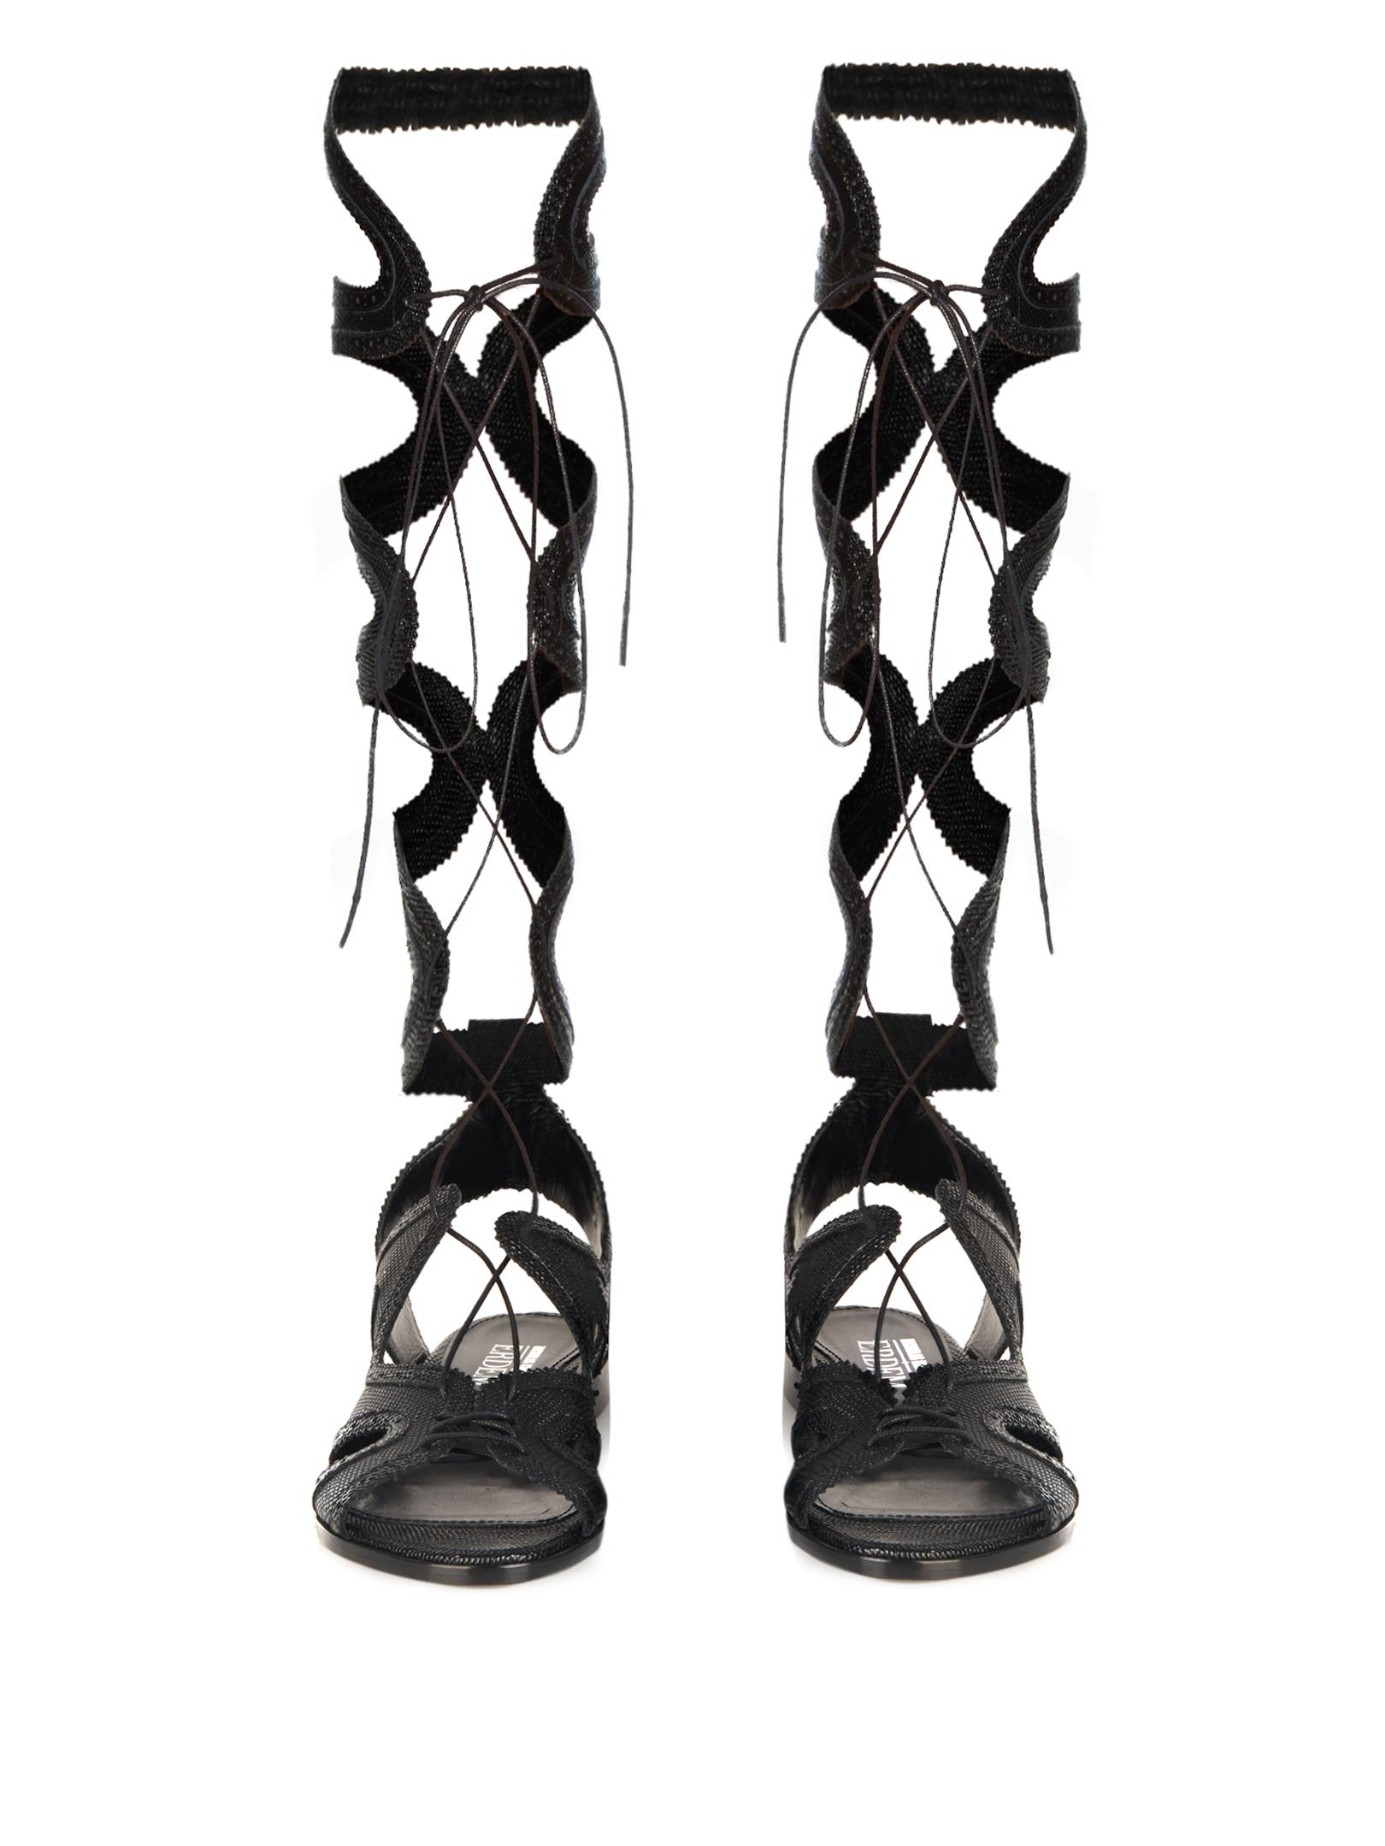 Enjoy Discount Low Price Nicholas Kirkwood Cloth Sandals ScUgO5Q